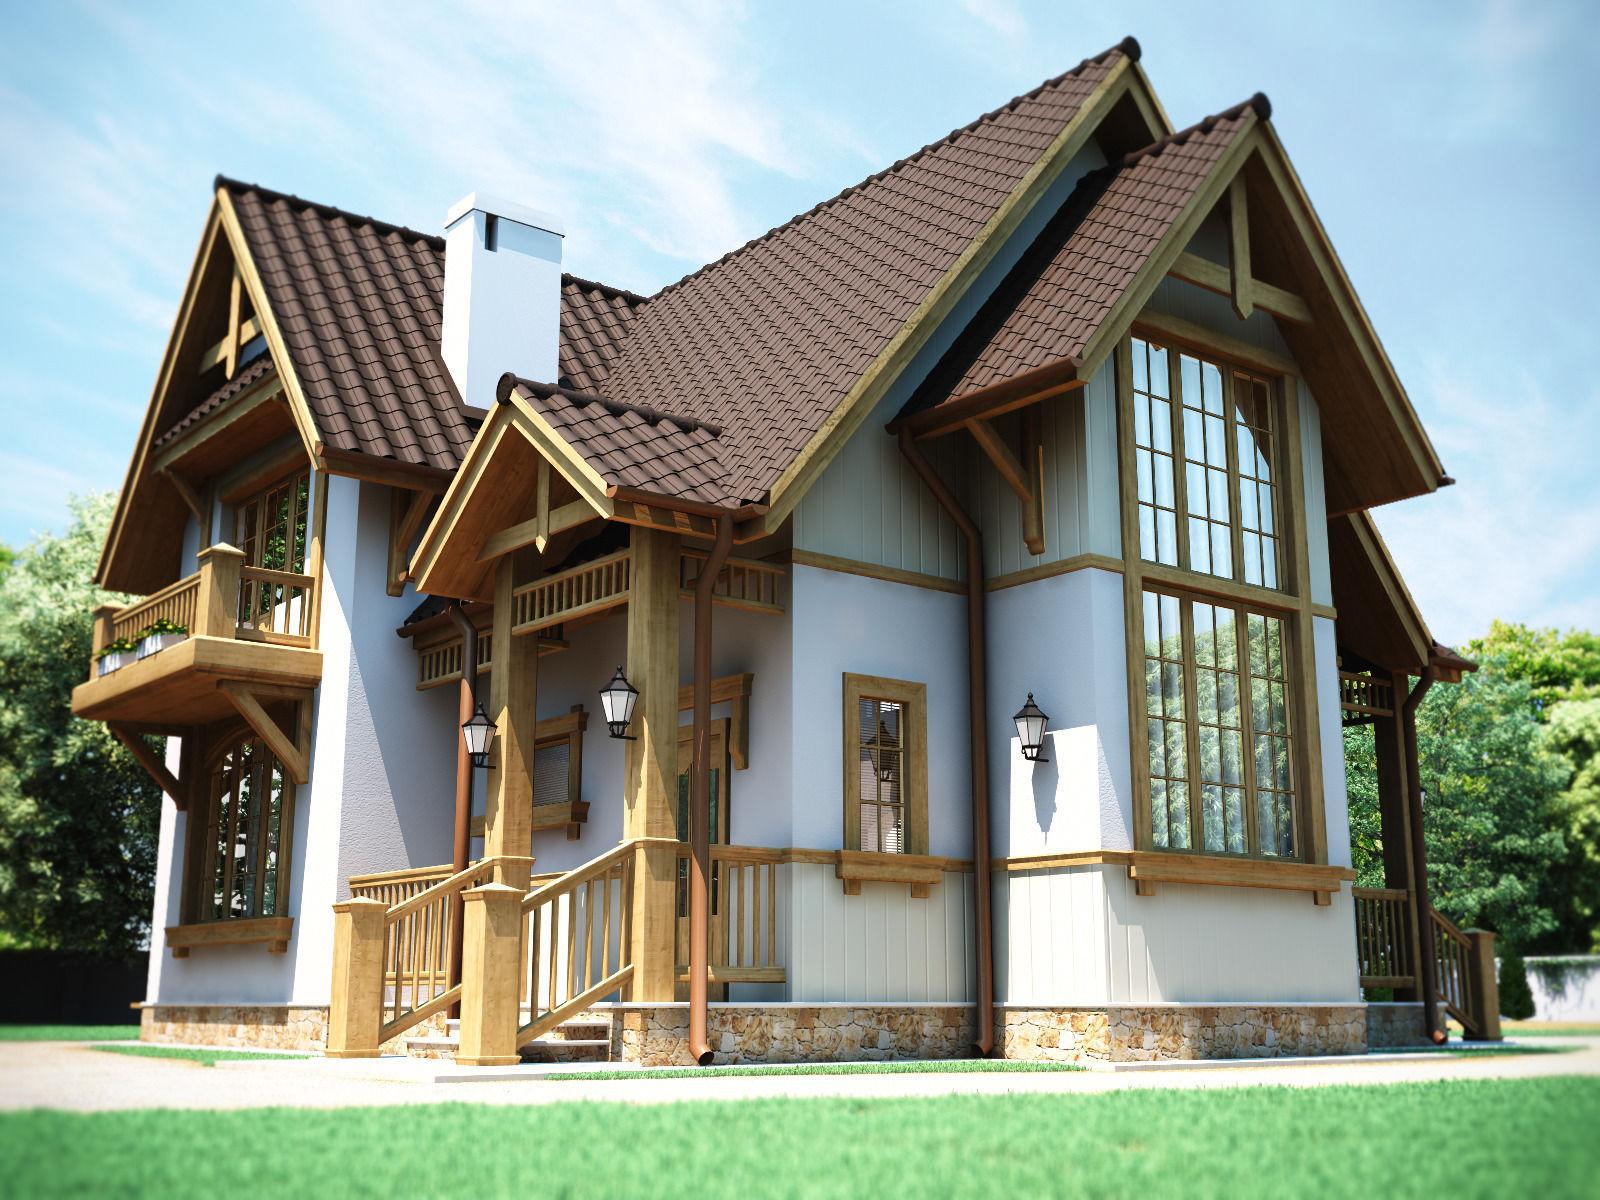 European Country House 3d Model Max Obj Fbx Mtl 1 ...